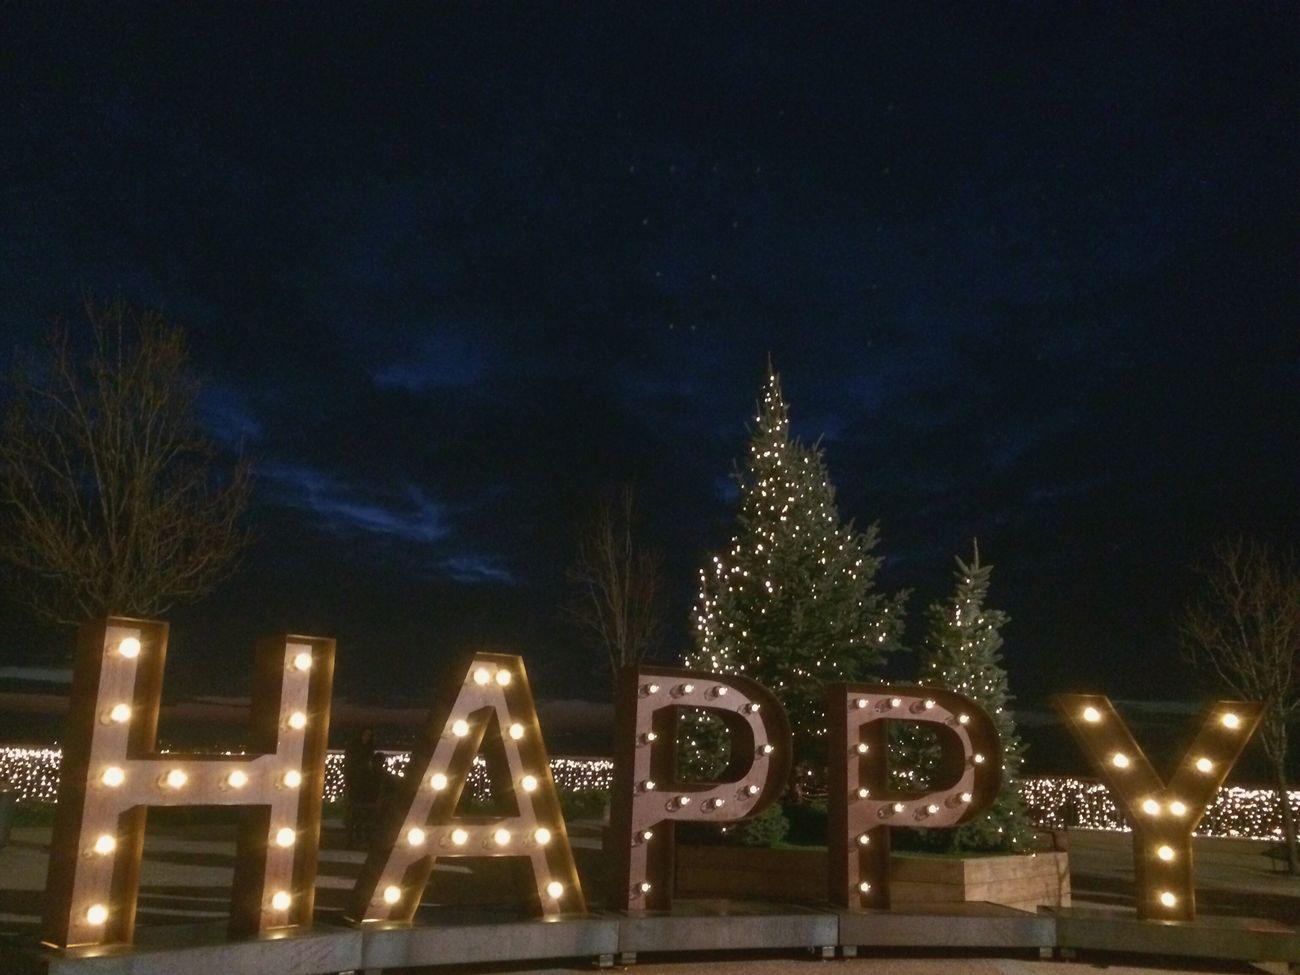 Night Text Illuminated Sky No People Outdoors Christmas Decoration Tree Communication Christmas Noche Letras Luminosas Iluminación Decoracion Navidad Happy Cielo